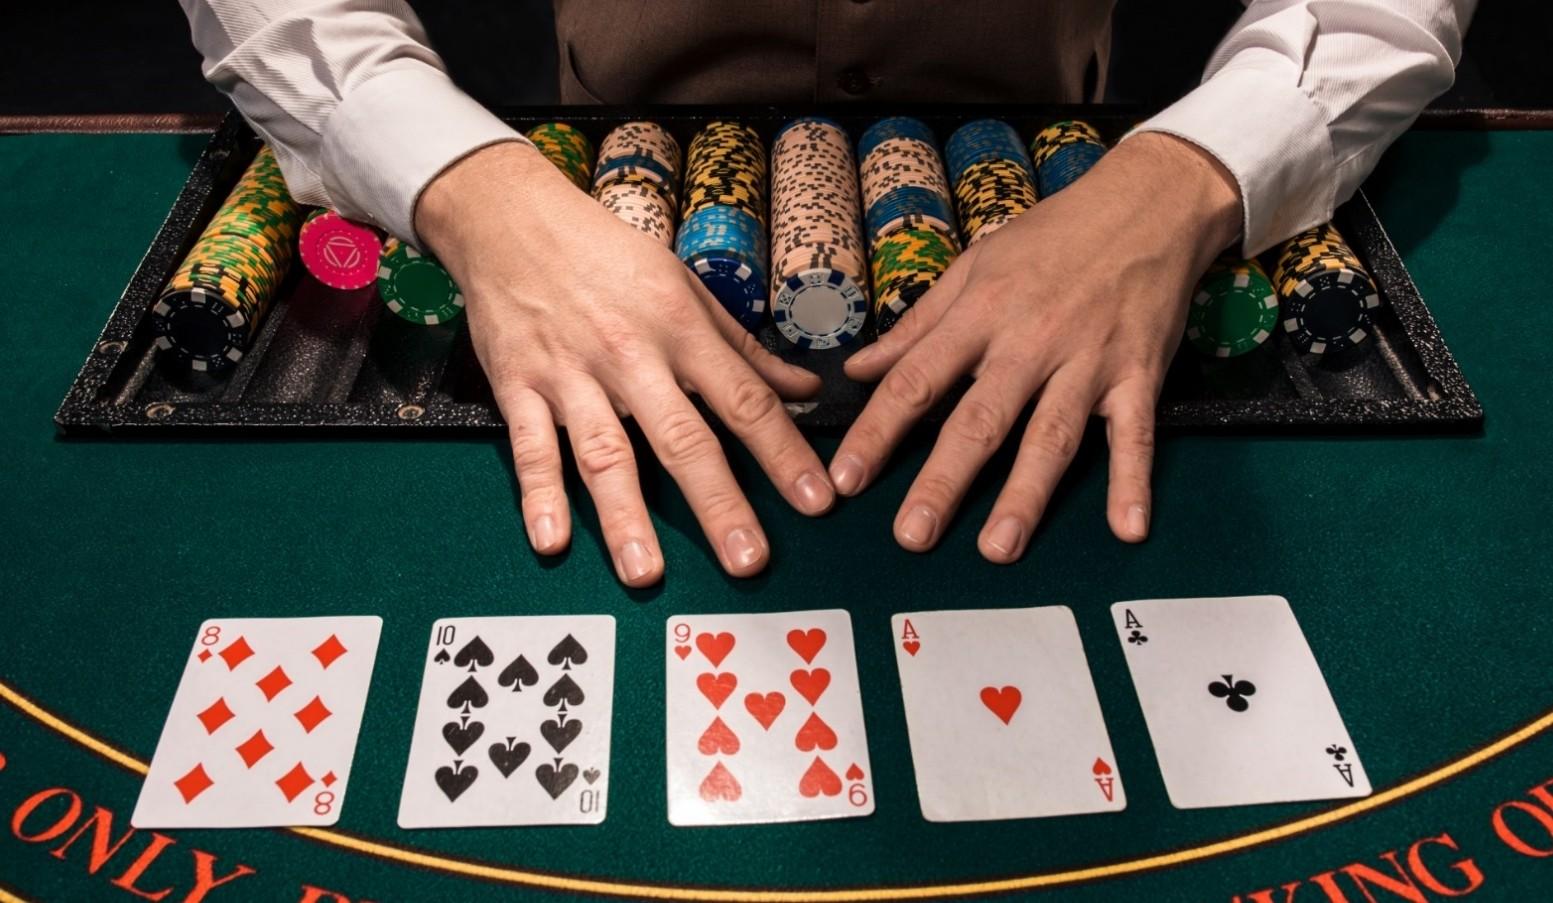 dealer hands on a poker table